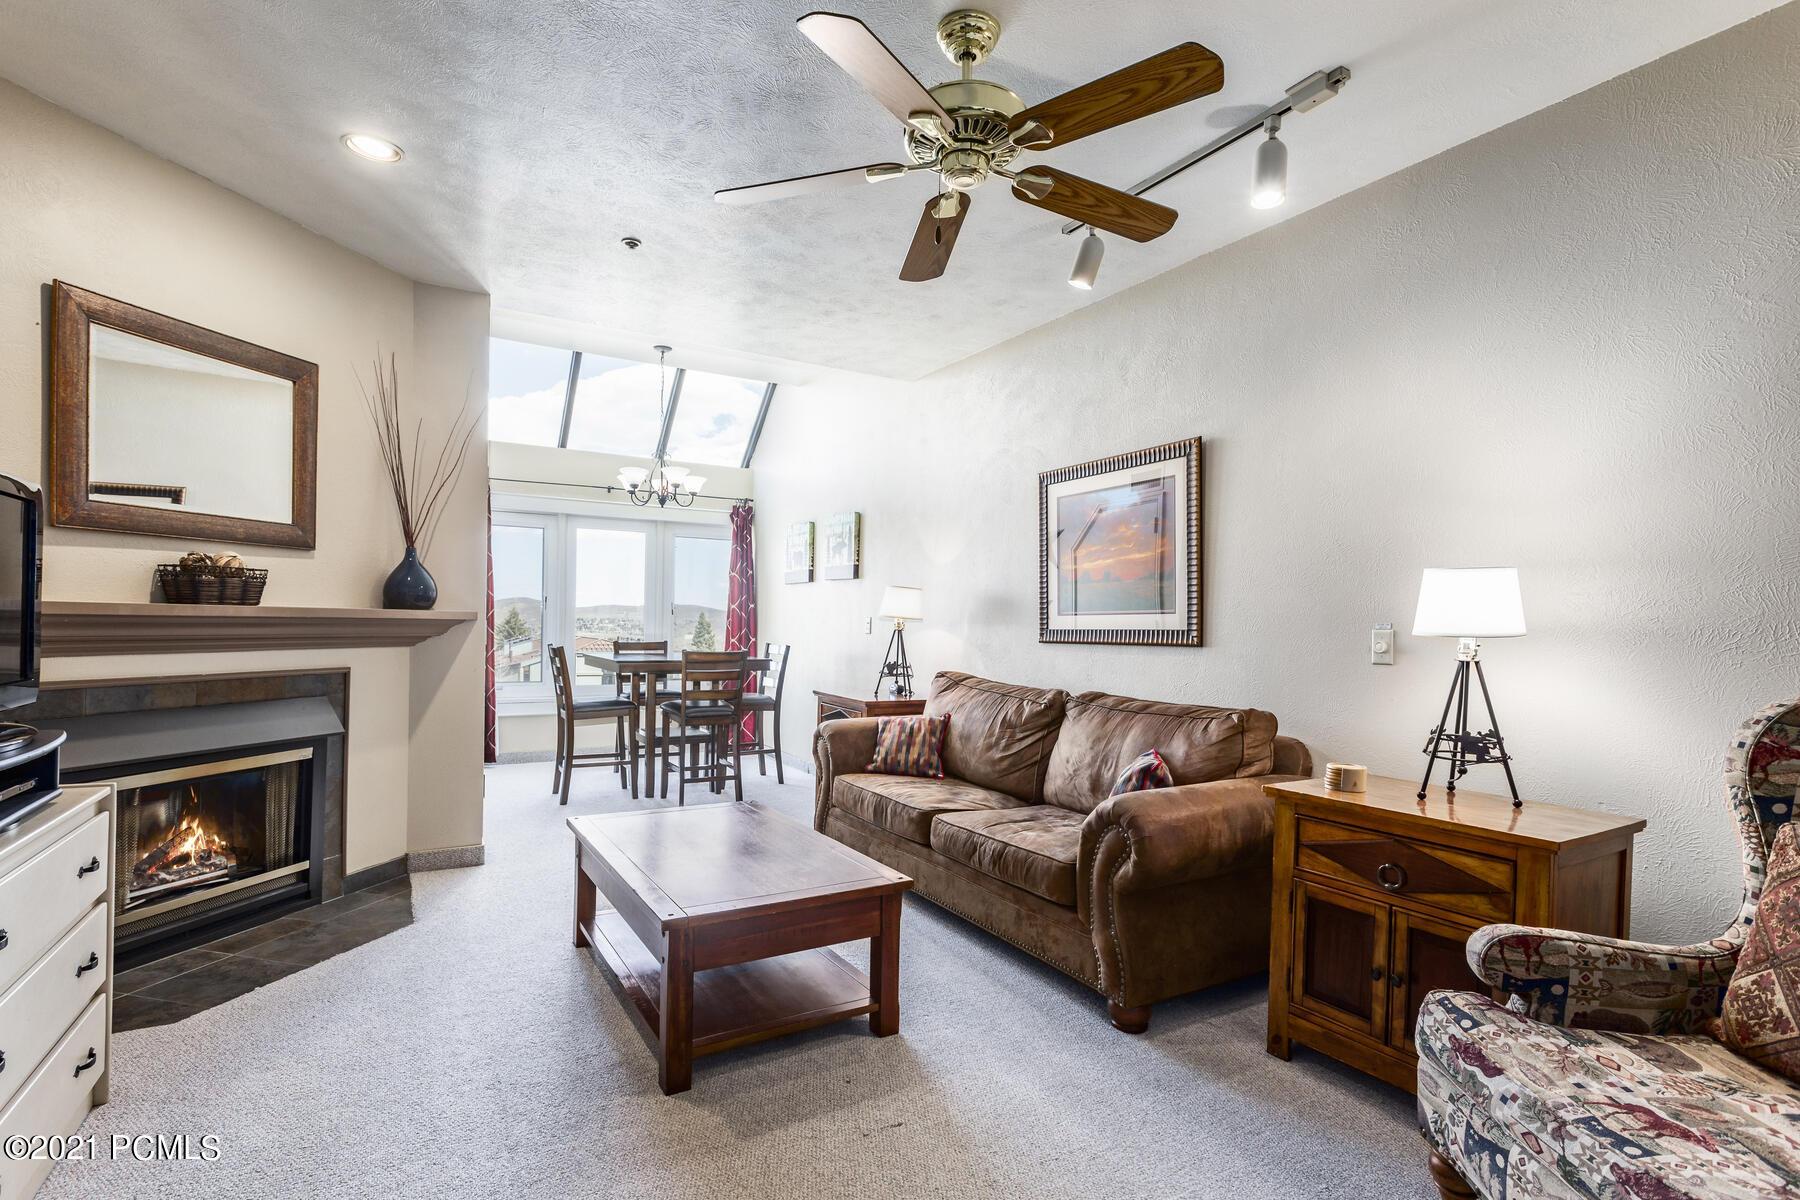 1415 Lowell Ave, Park City, Utah 84060, ,1 BathroomBathrooms,Condominium,For Sale,Lowell Ave,12101357